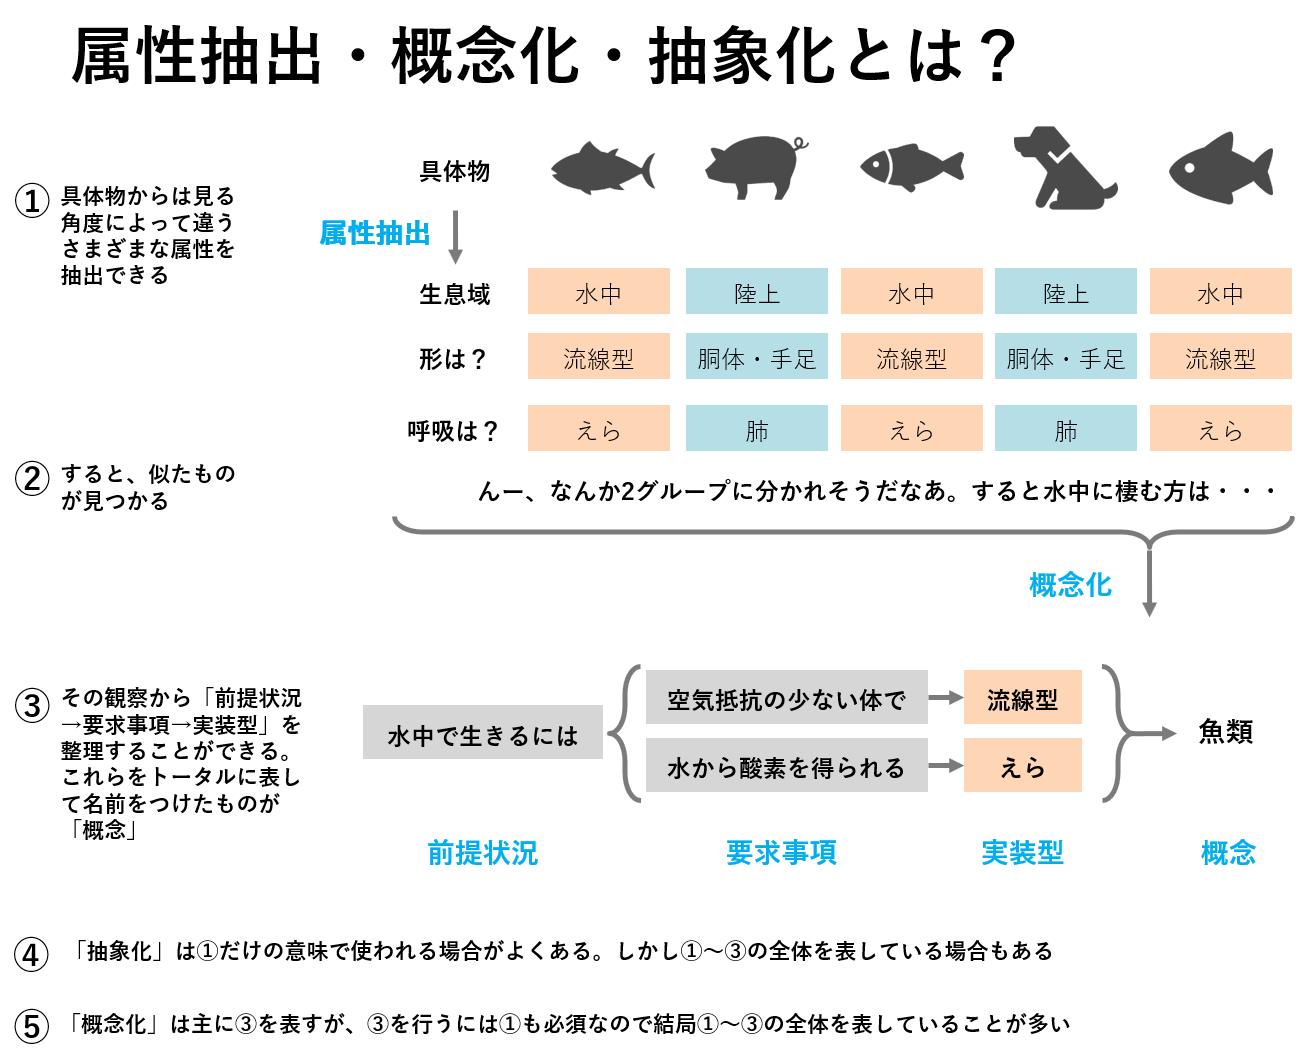 https://blogs.itmedia.co.jp/doc-consul/capture181220-165314-1168.png